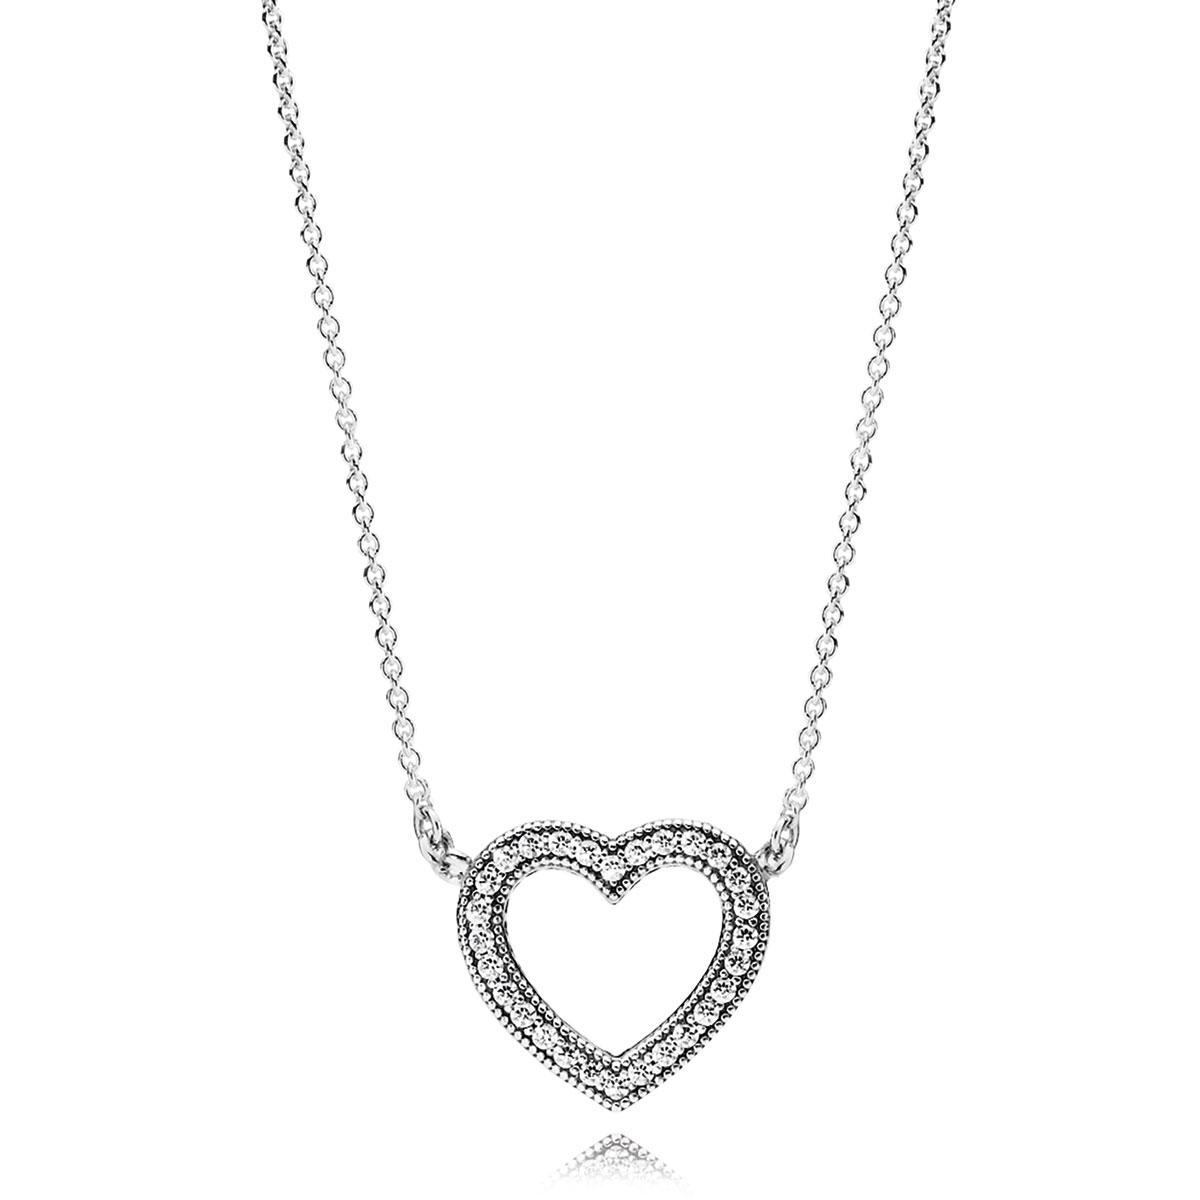 Pandora necklaces pancharmbracelets pandora loving hearts of pandora clear cz necklace aloadofball Images